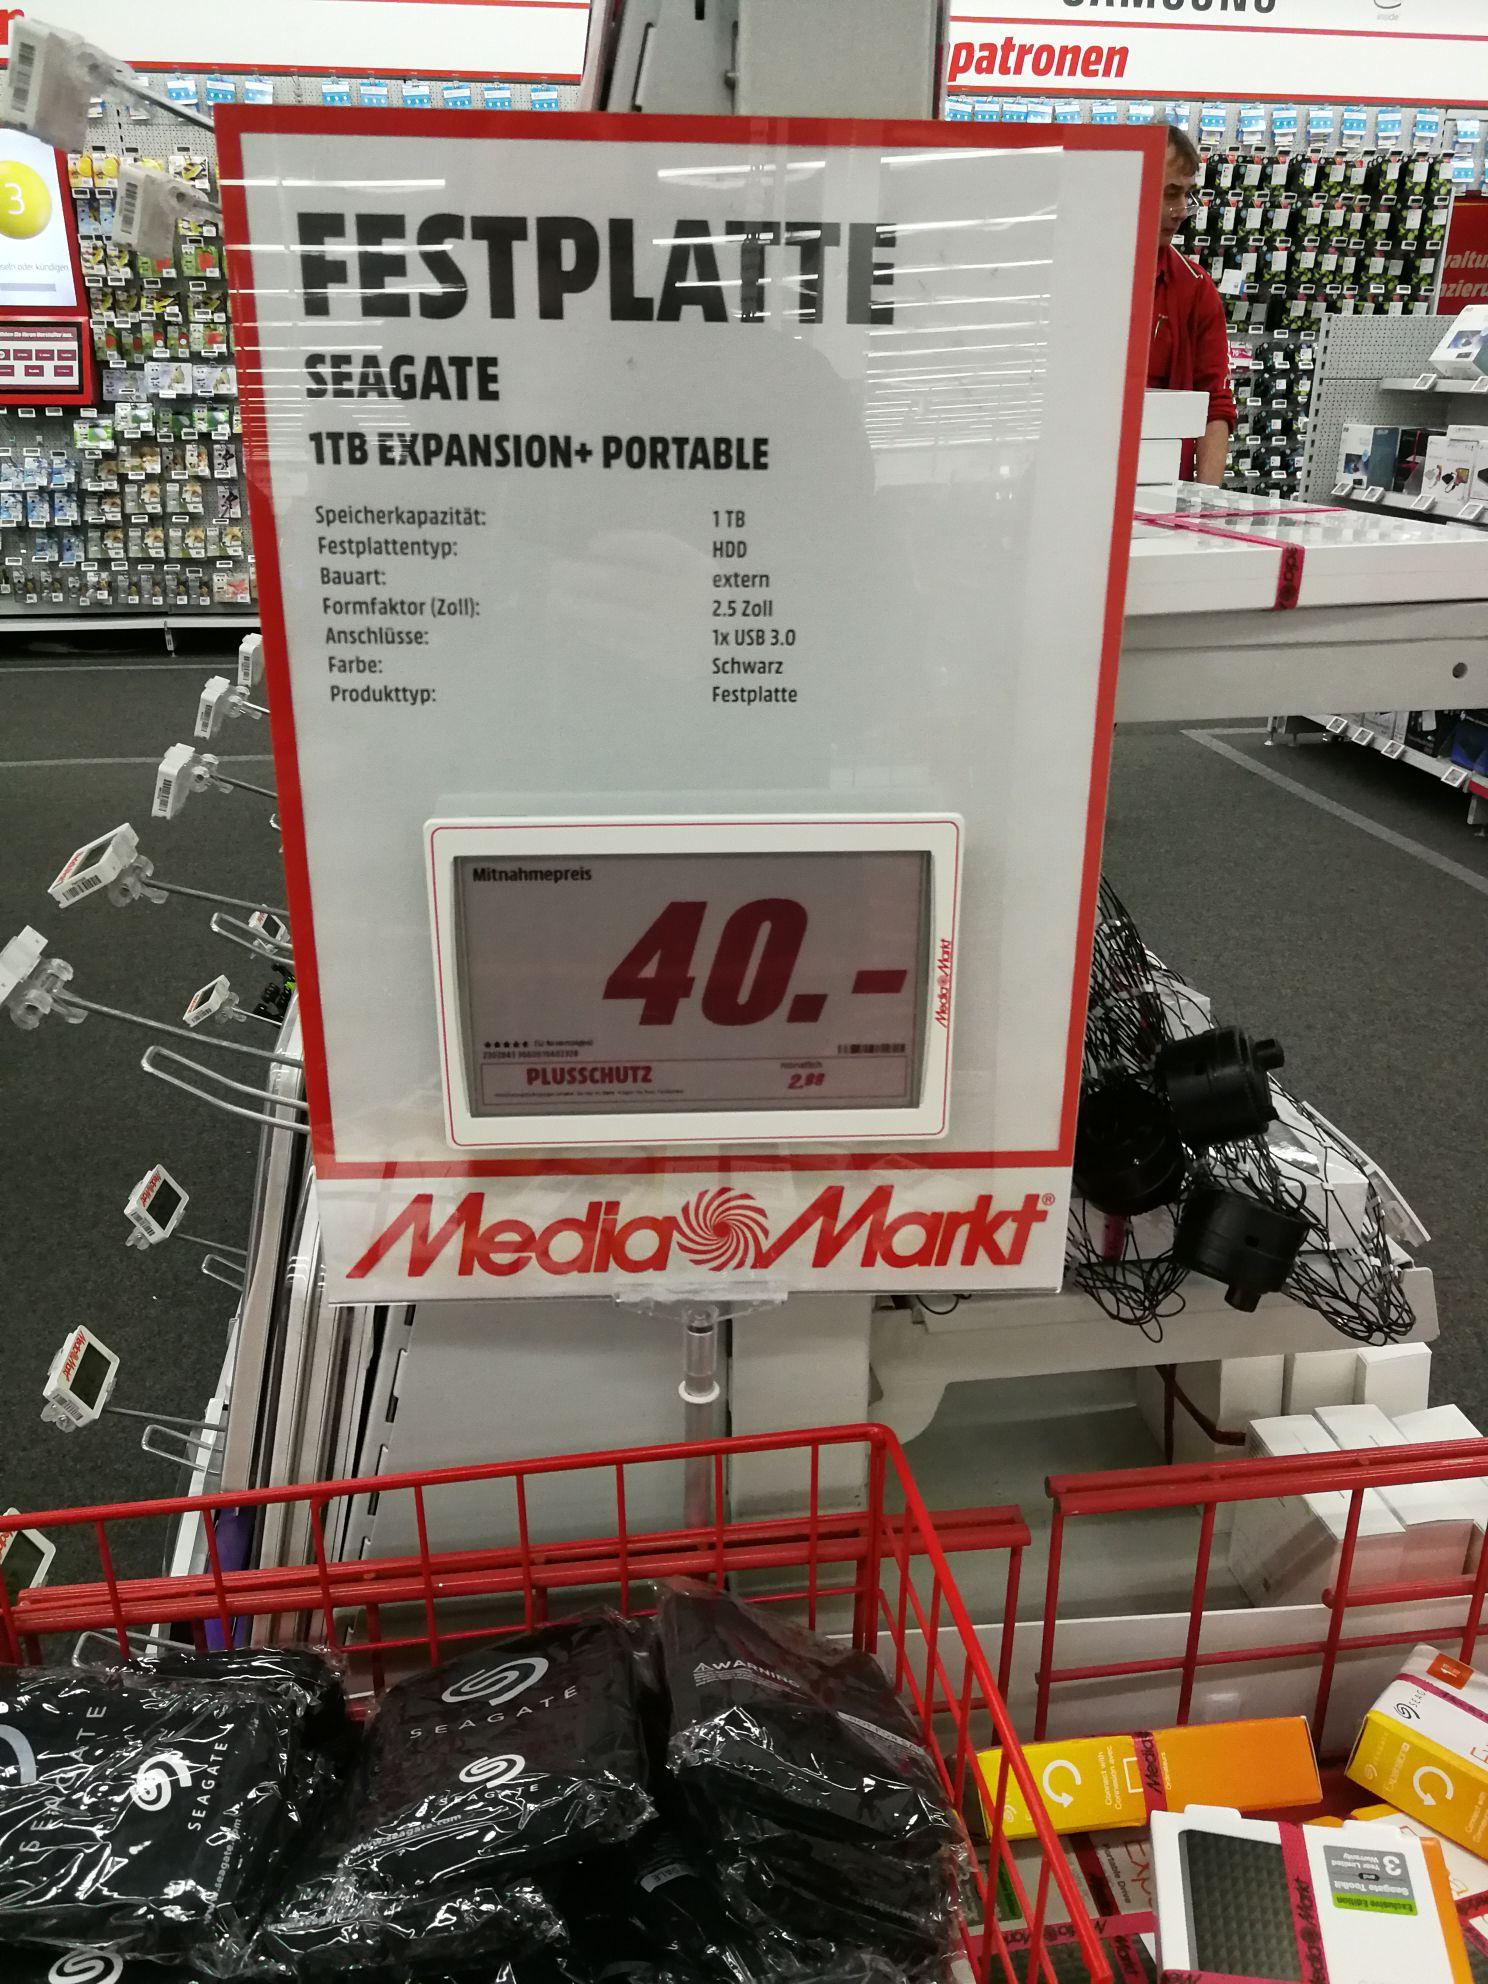 [Lokal: Mediamarkt Münster] Seagate Expansion+ Portable 1TB Festplatte HDD (STEA1000400)